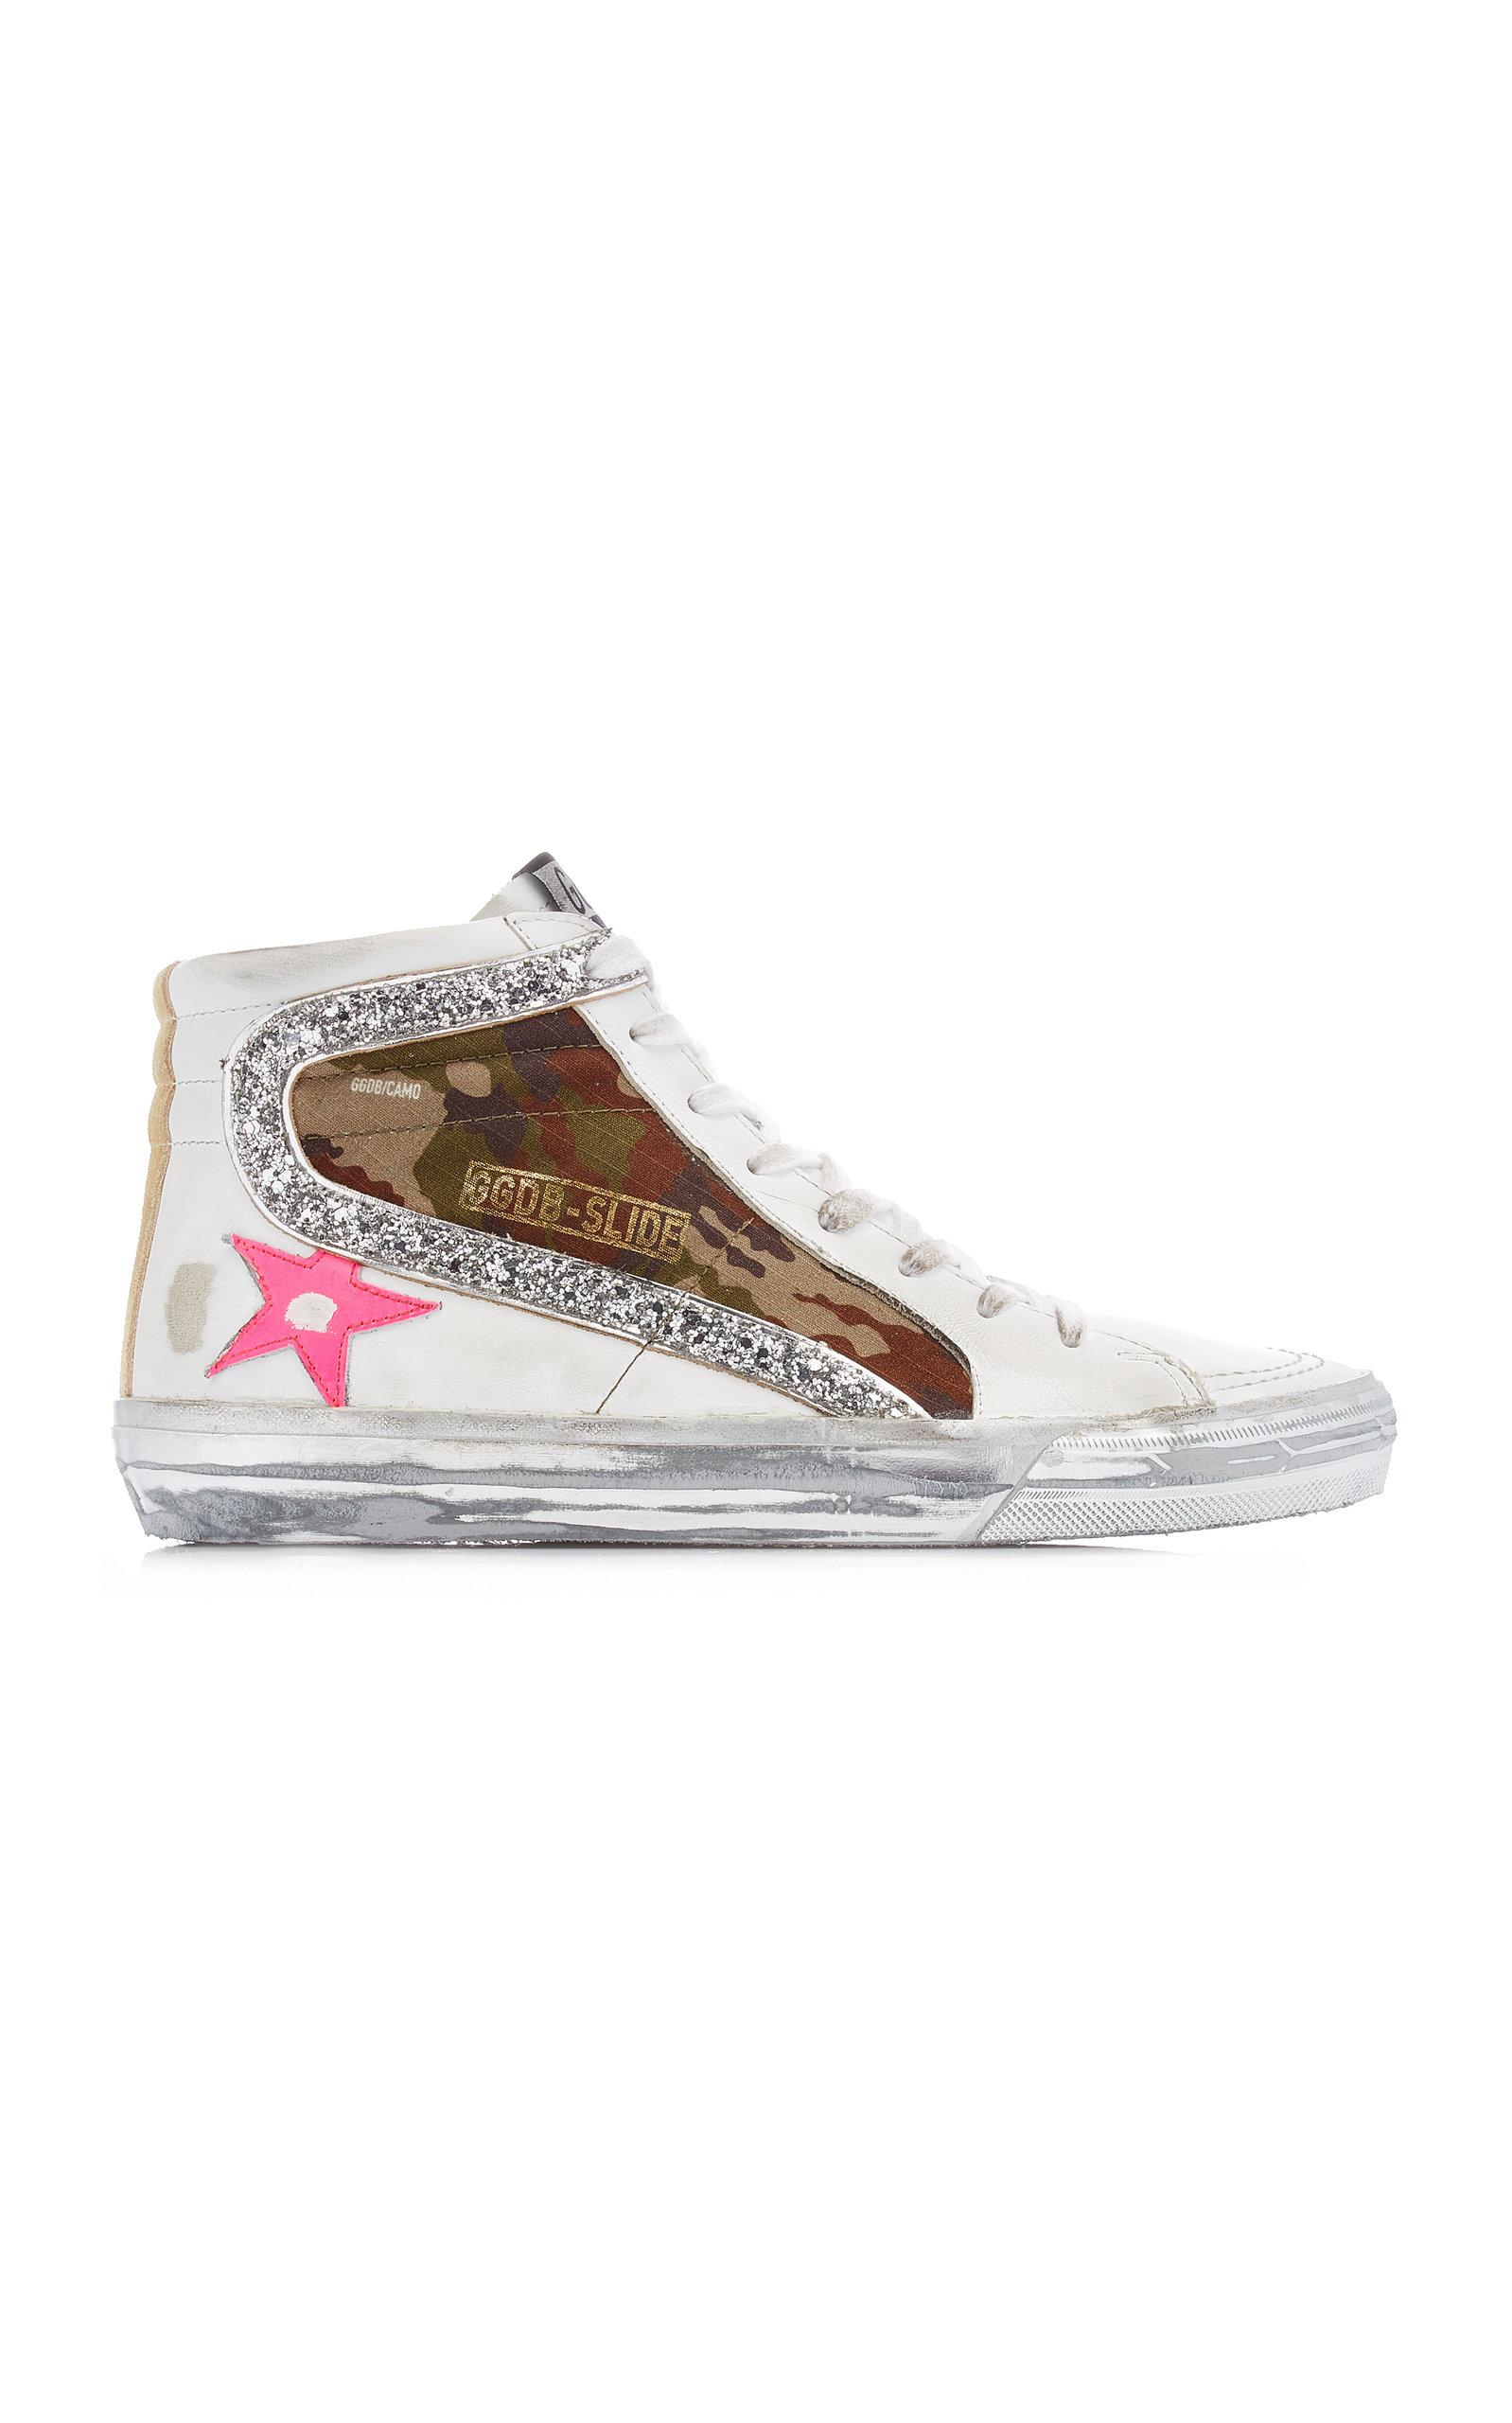 Golden Goose - Women's Slide Camo Suede and Leather Sneakers - White - Moda Operandi